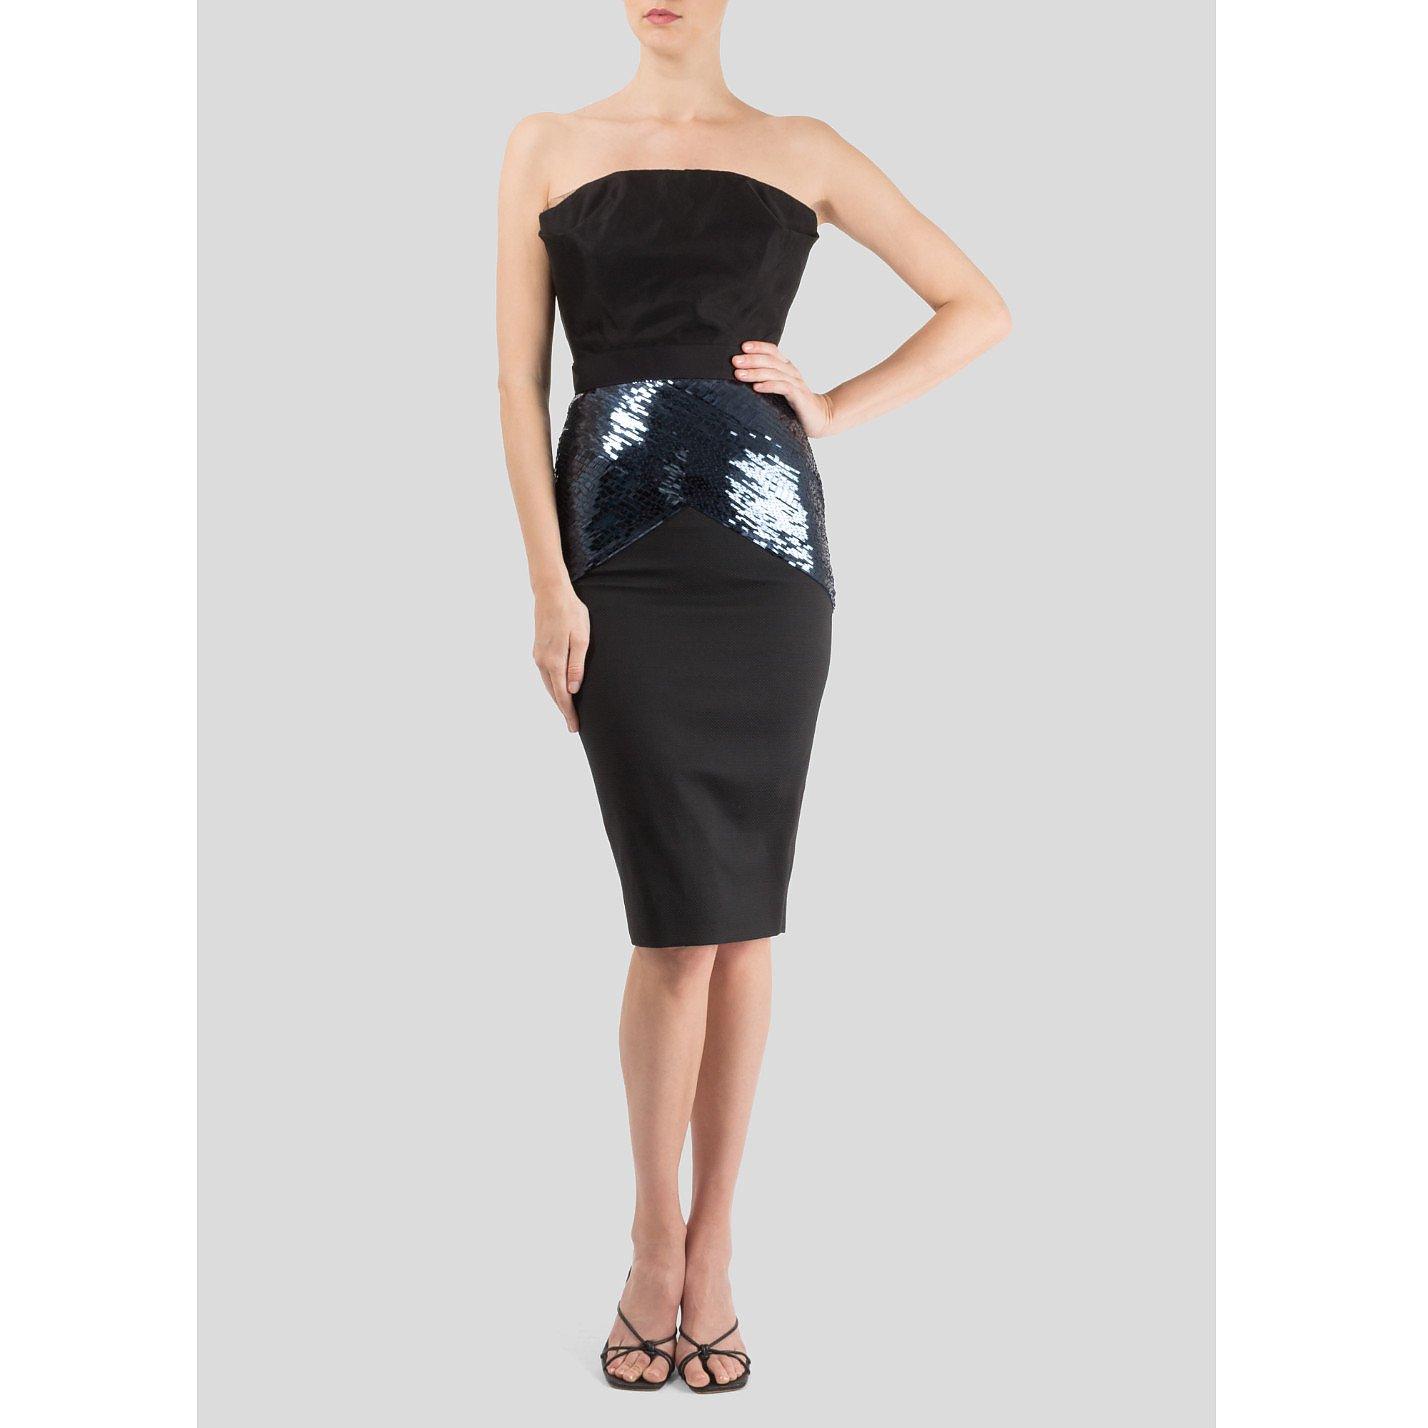 Victoria Beckham Strapless Cocktail Dress